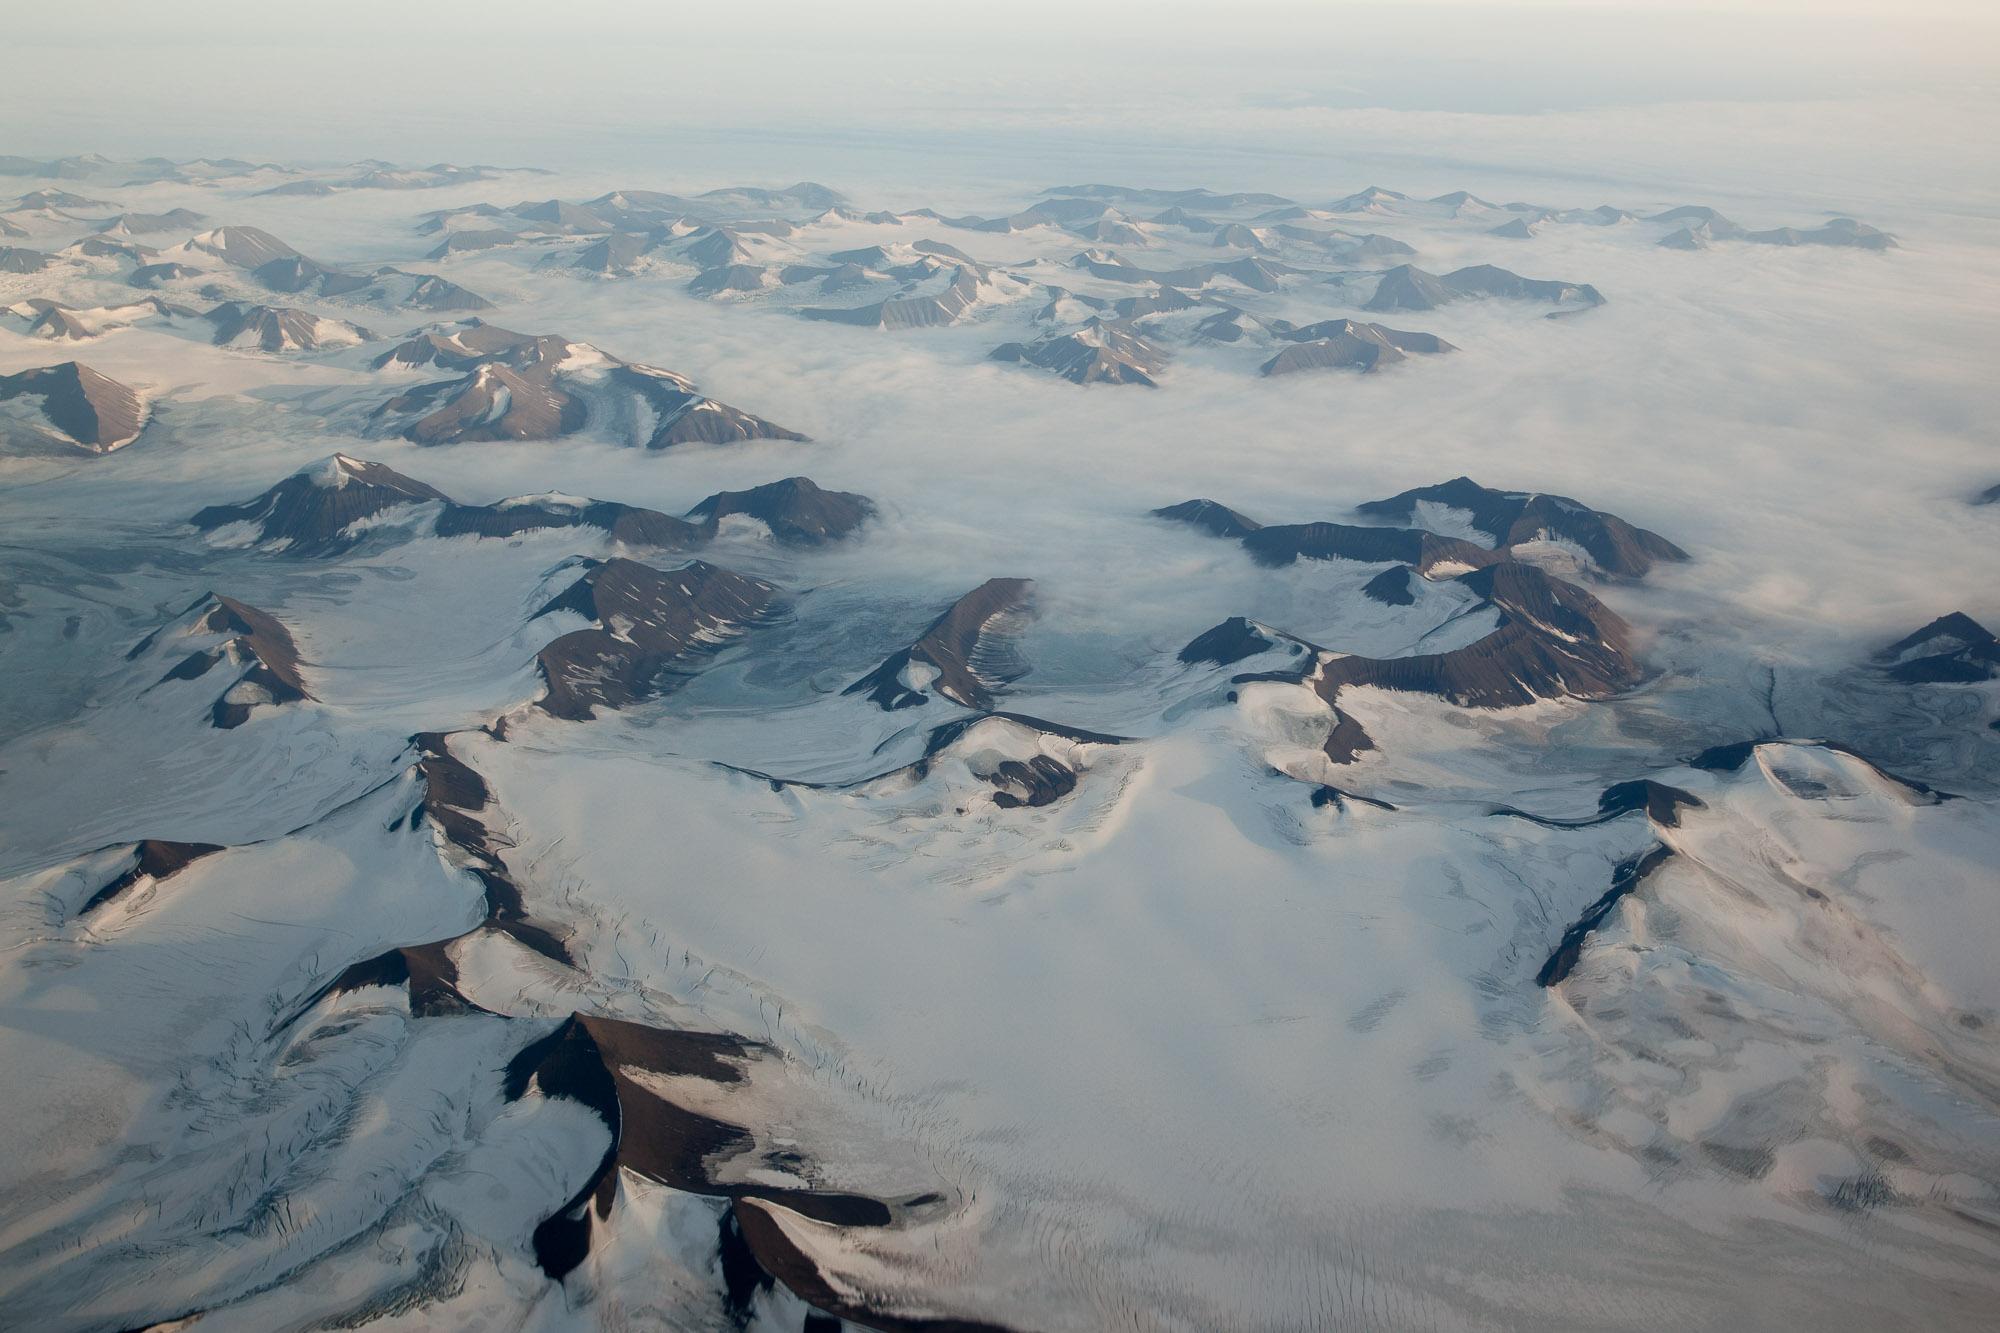 arctic-svalbard-0448.jpg